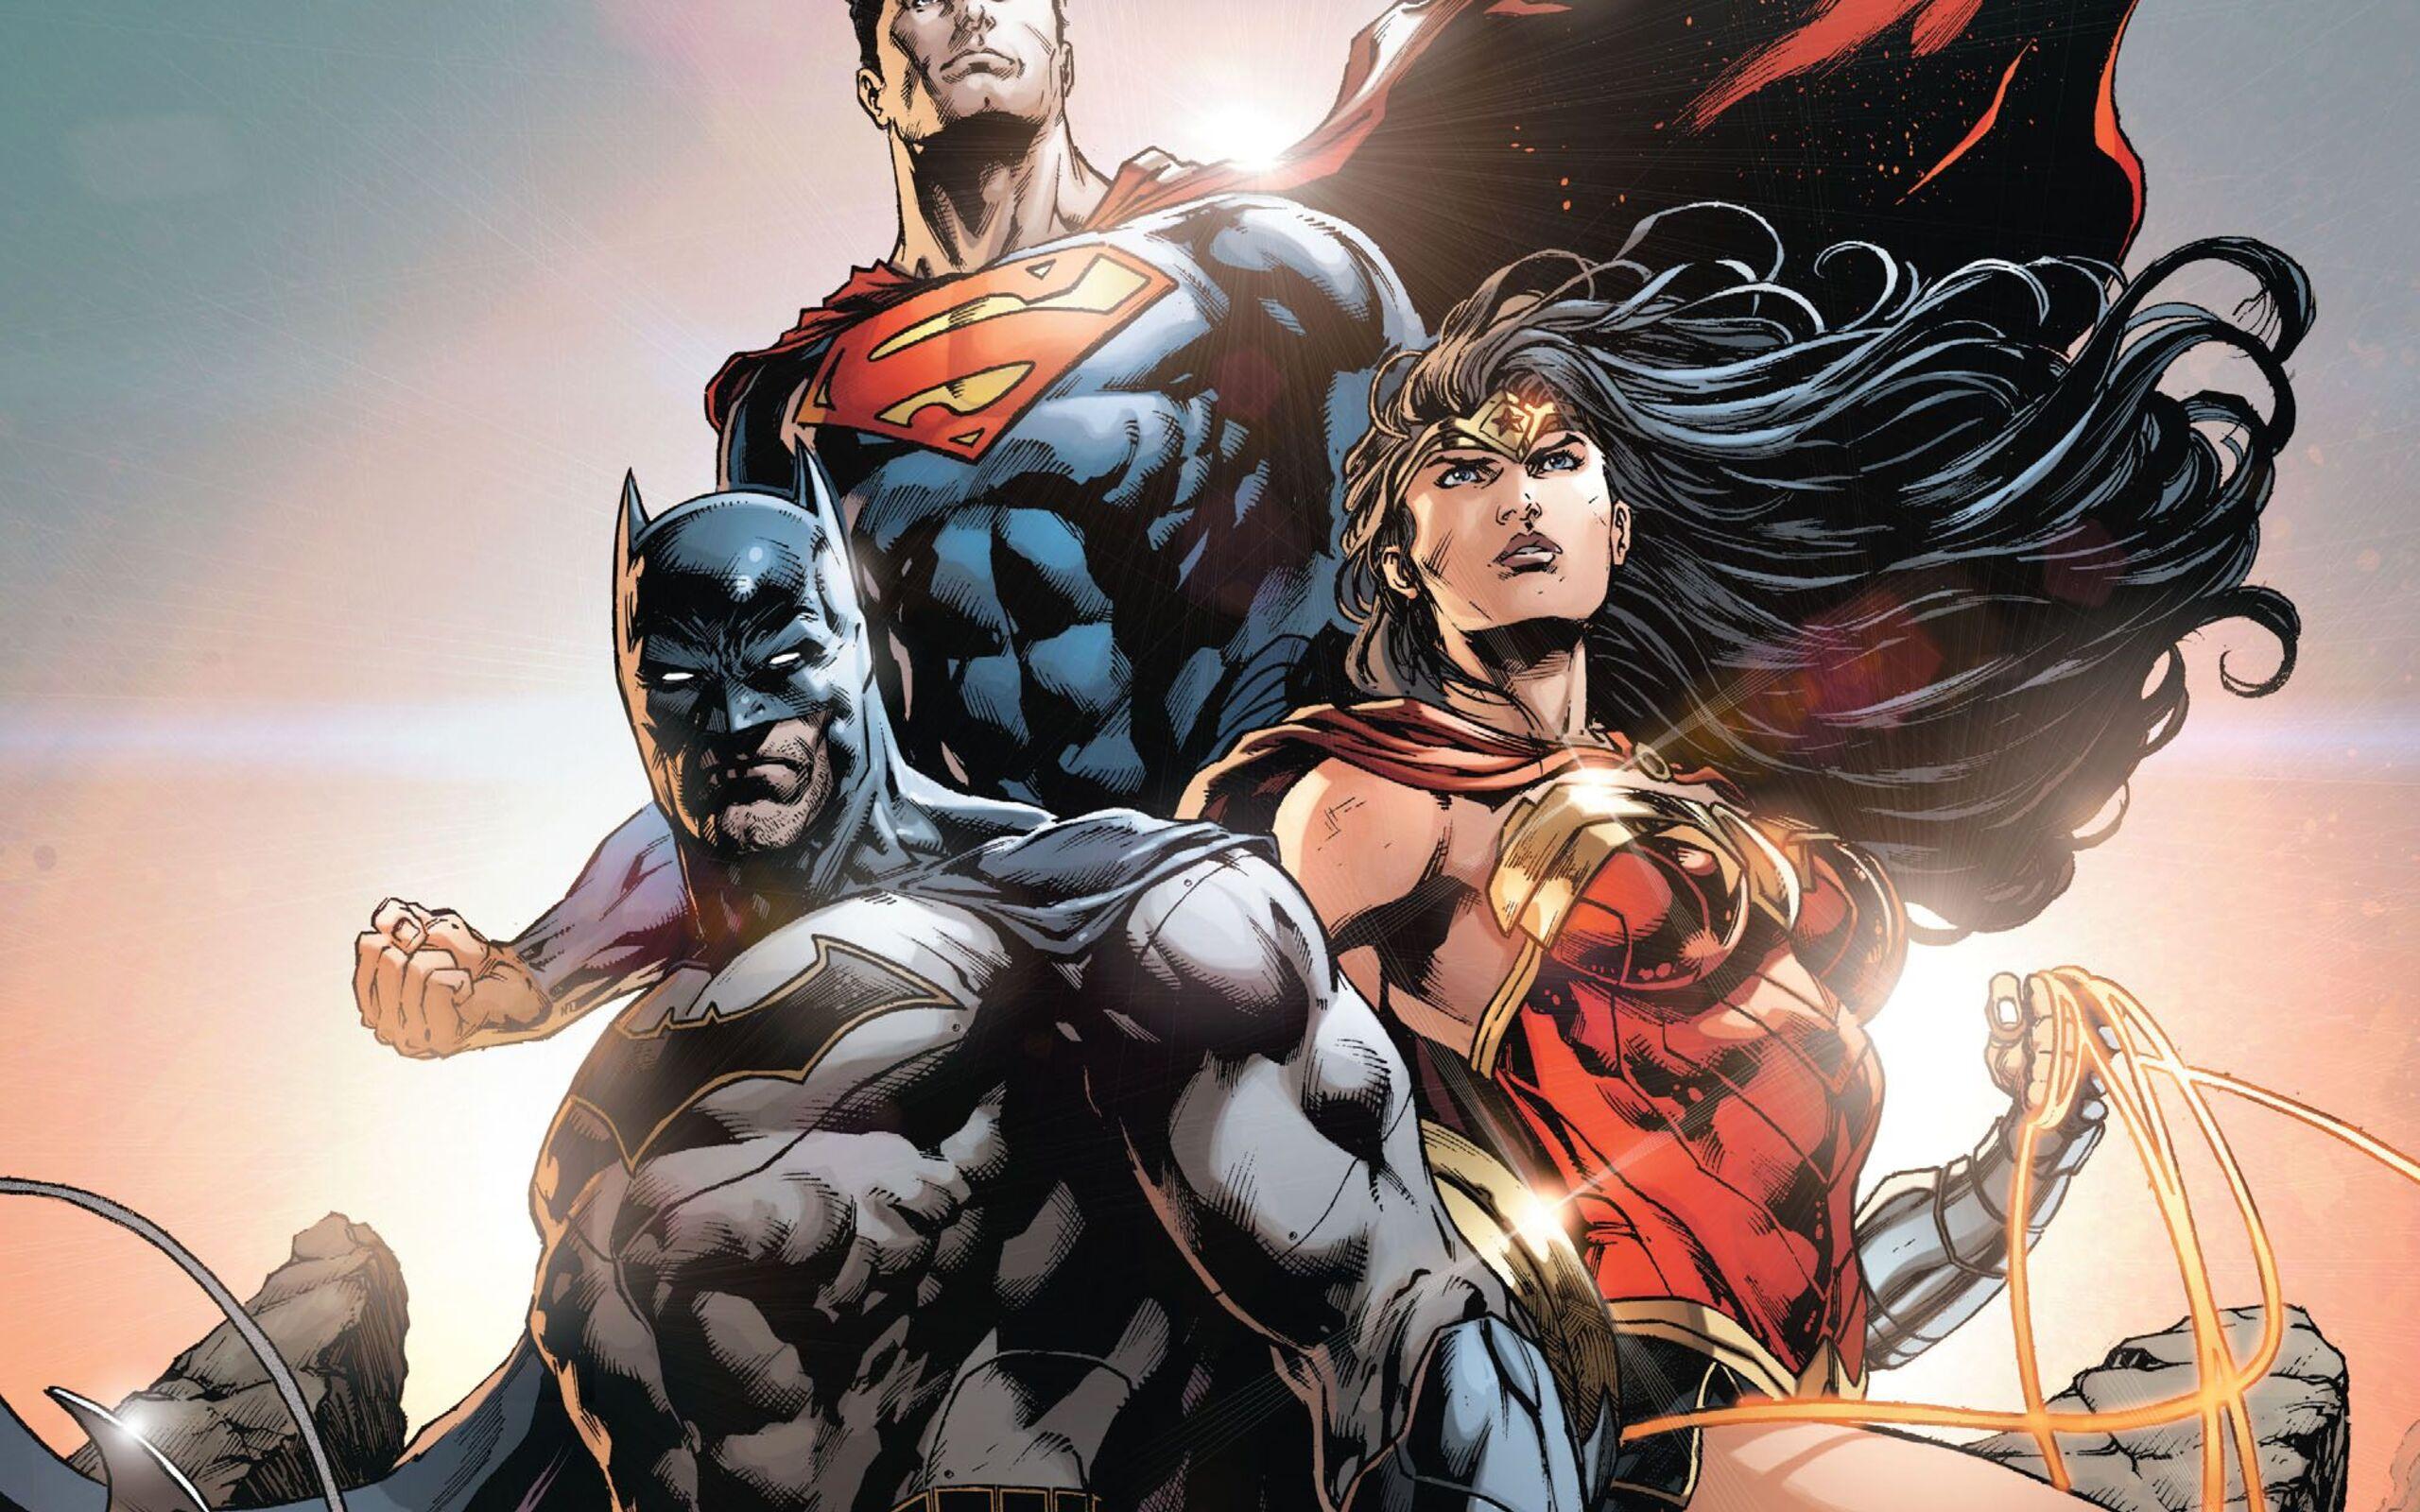 superman-batman-wonder-woman-artwork-79.jpg